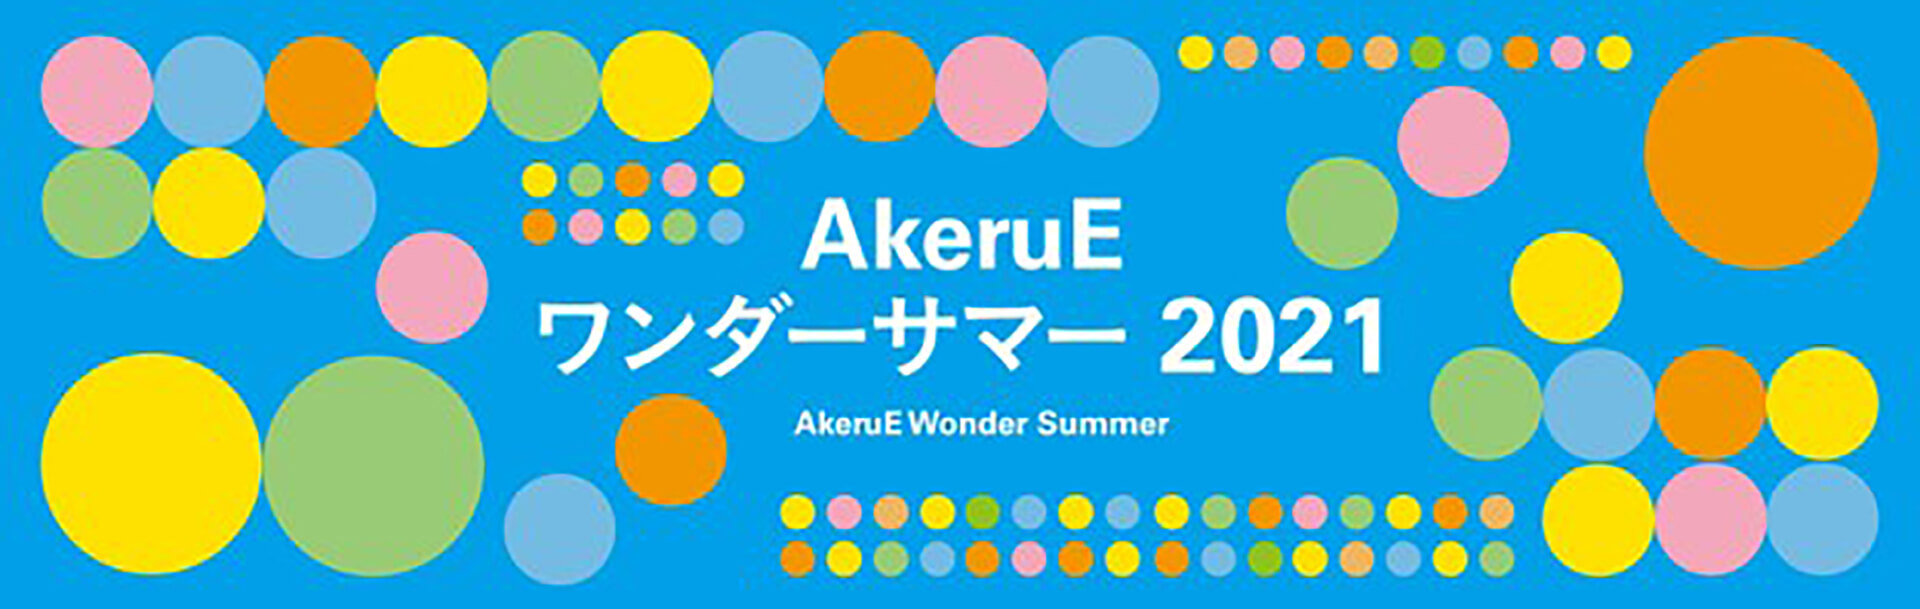 AkeruEワンダーサマー2021